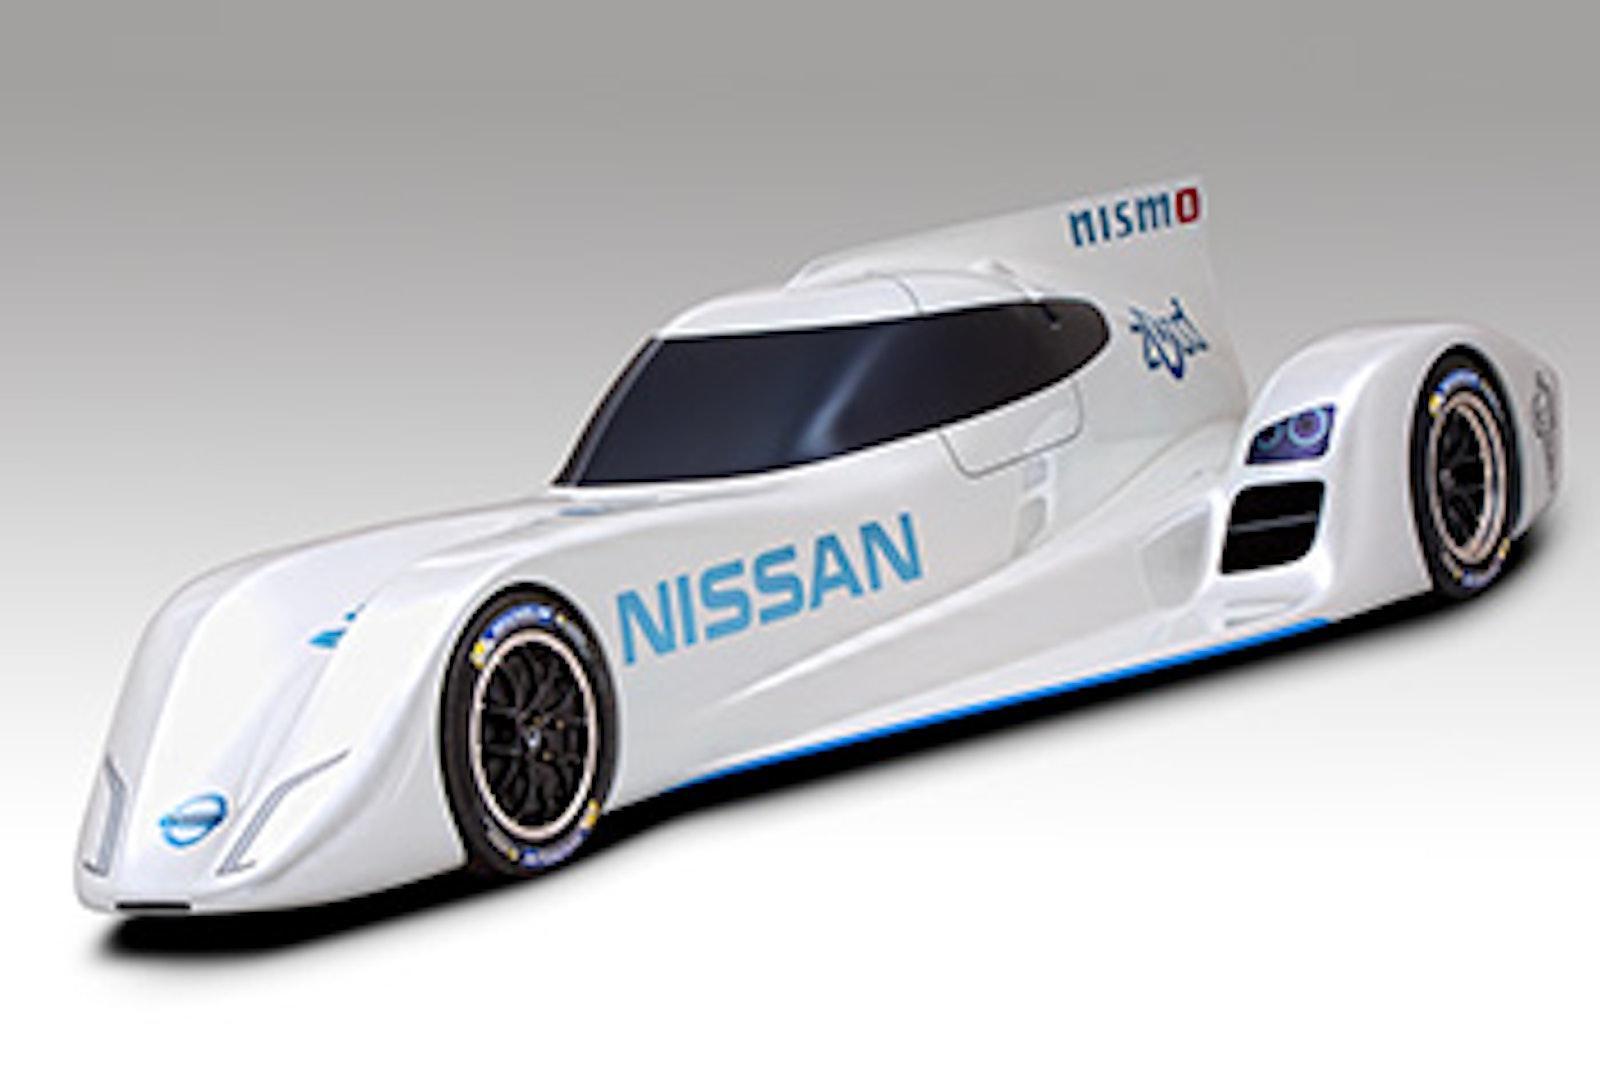 Nissan Unveils Le Mans Prototype Plans For Fastest Electric Racing Car